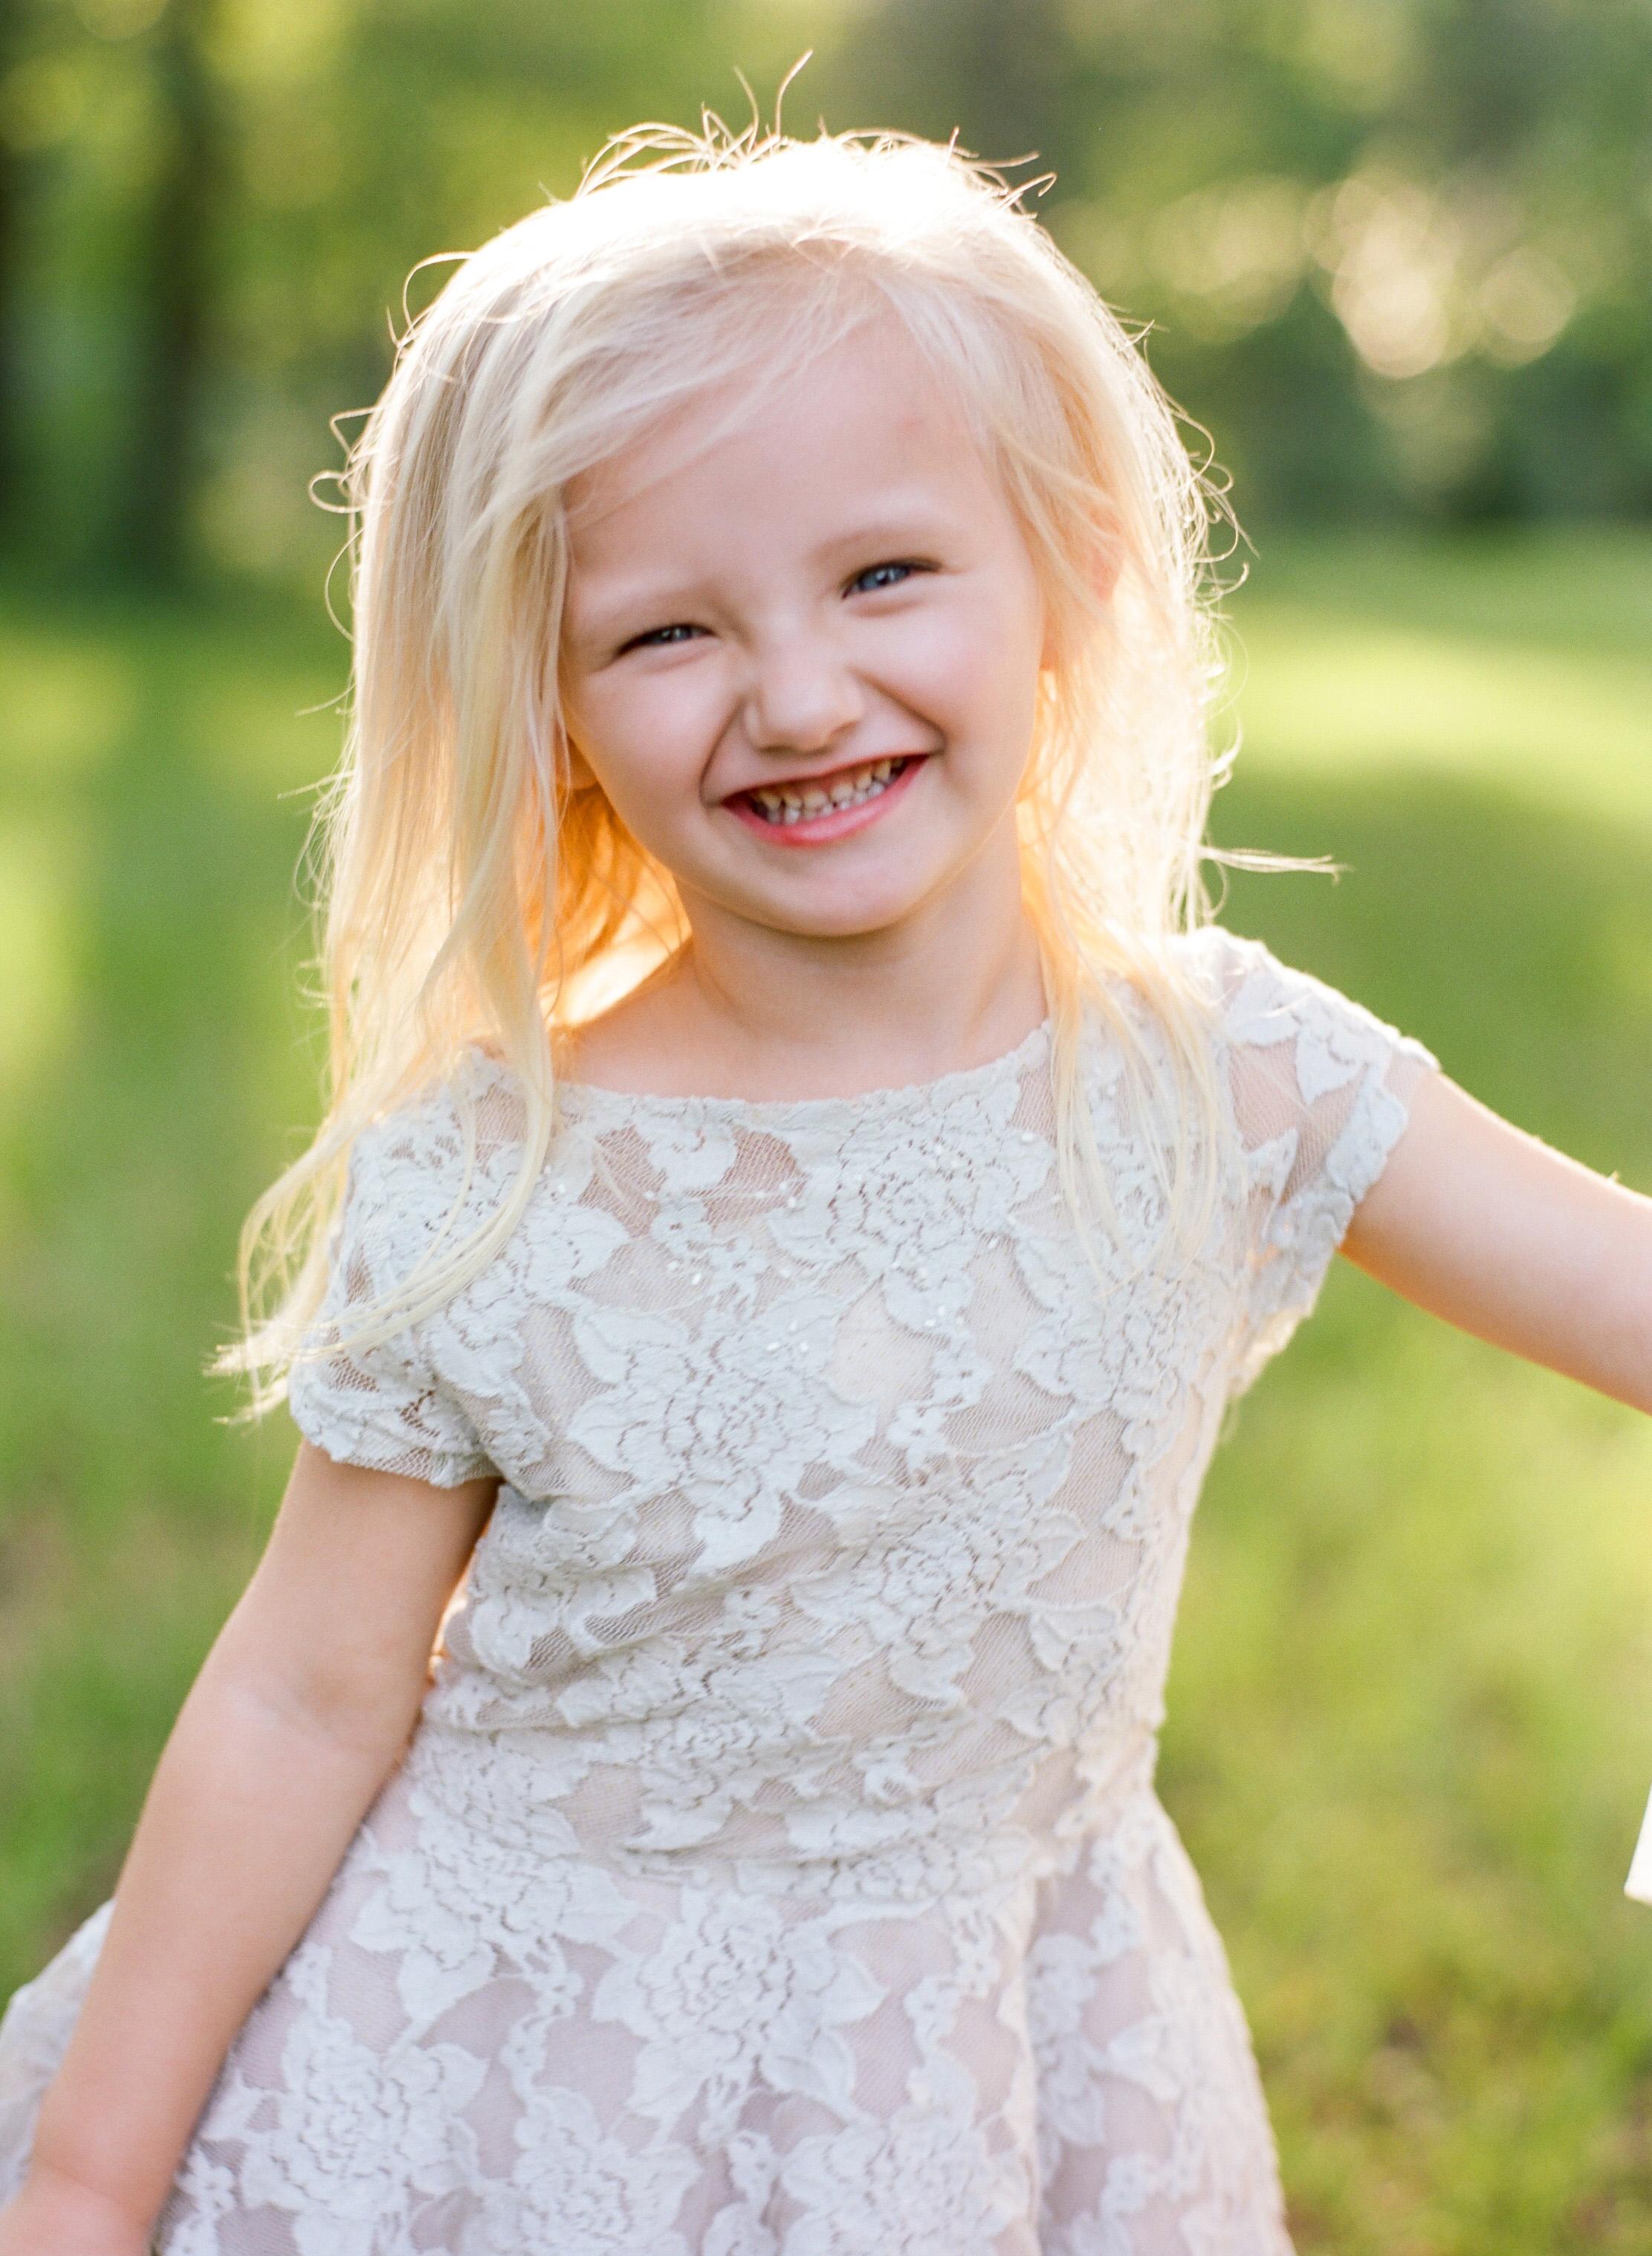 Dana-Fernandez-Photography-Houston-Portrait-Photographer-Film-Children-Family-Maternity-Senior-Photographer-13.jpg